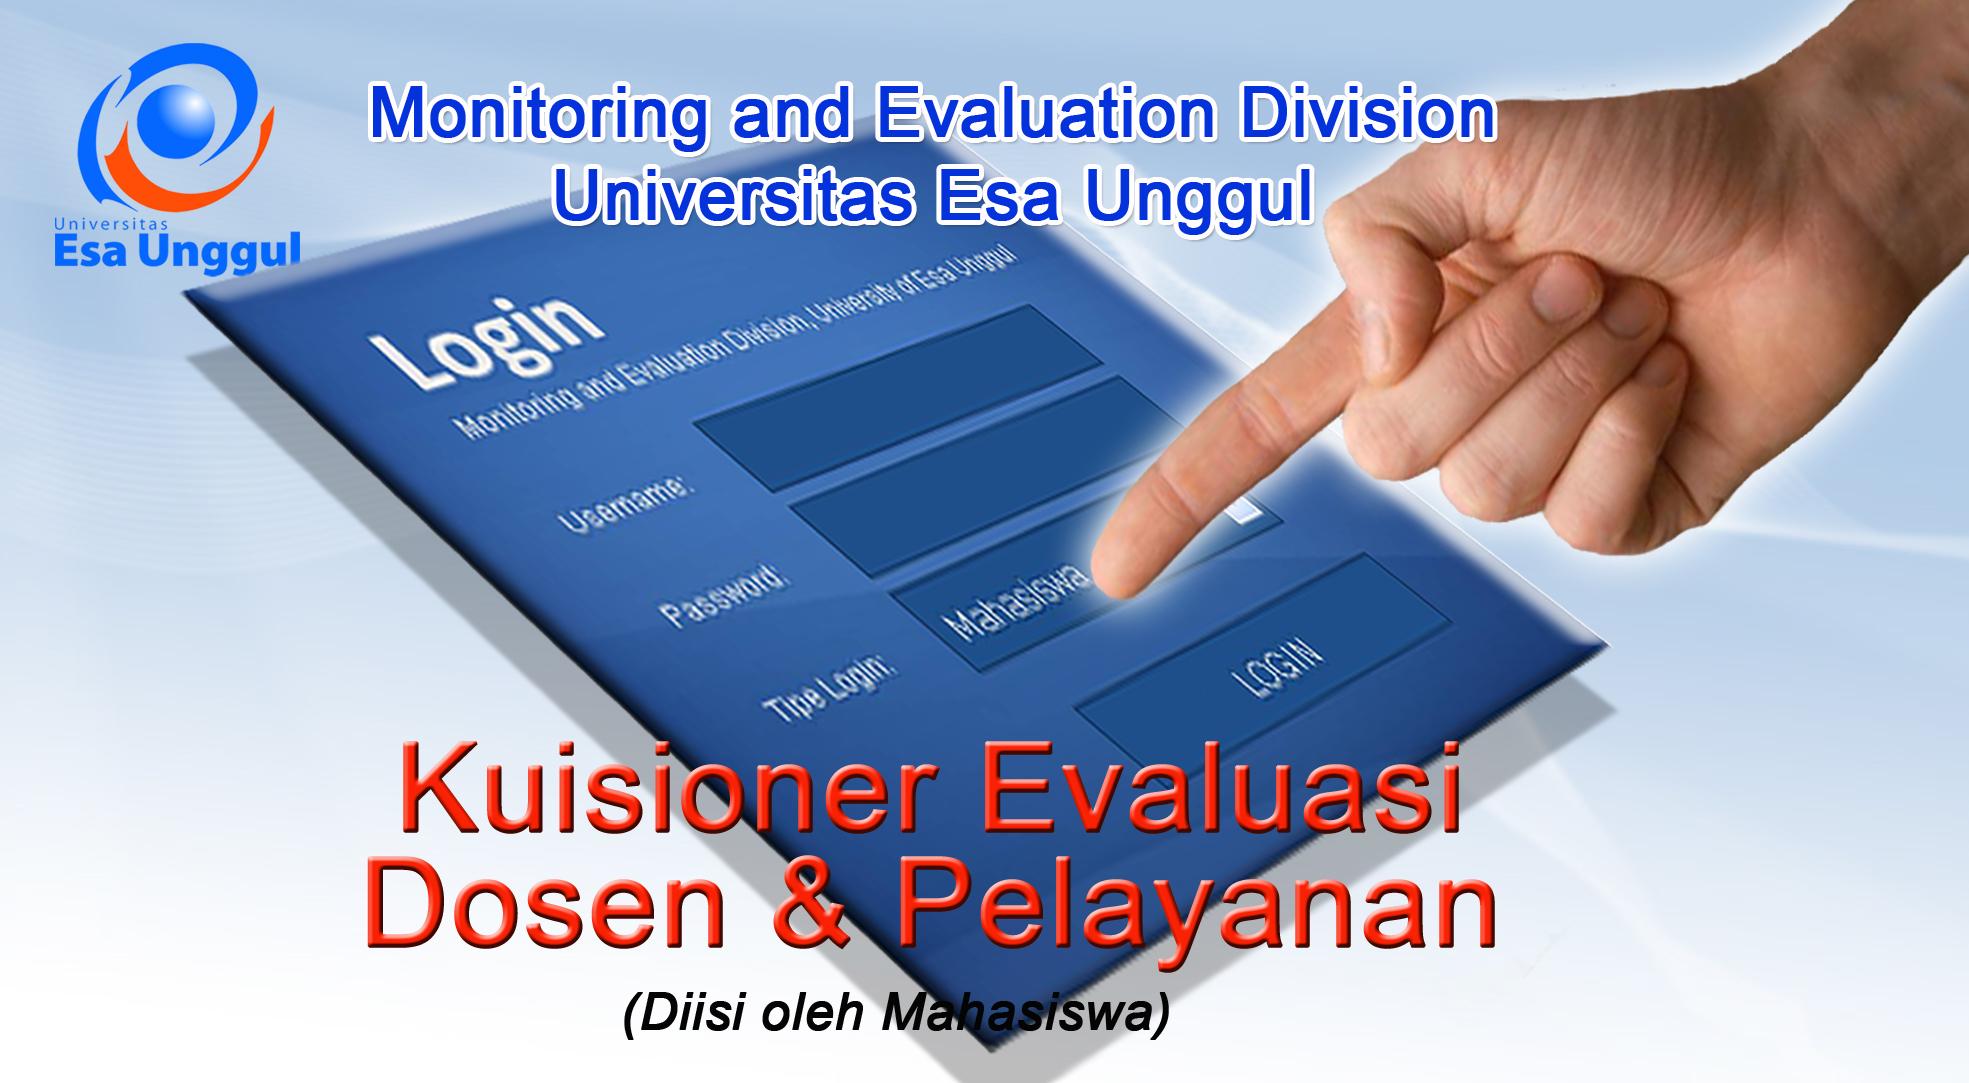 Pengisian KUISIONER EVALUASI DOSEN & PELAYANAN – Monitoring and Evaluation Division Universitas Esa Unggul